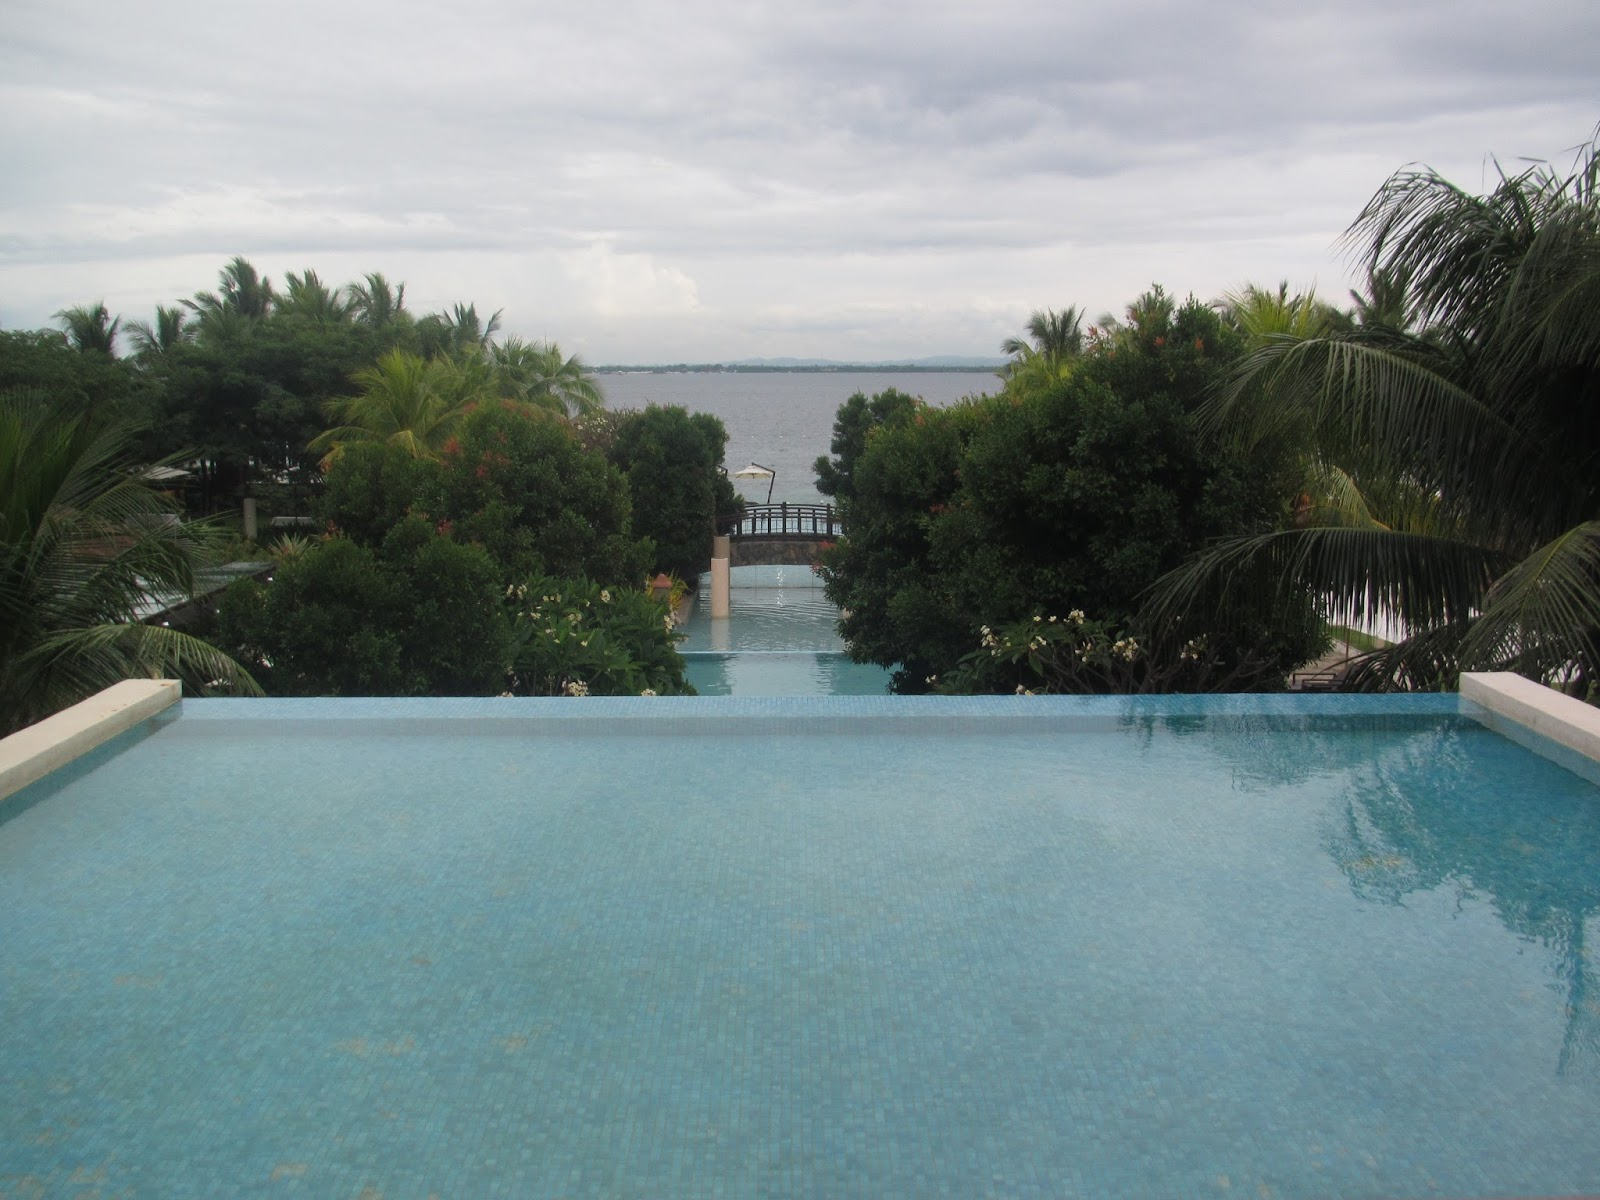 Where to stay in Cebu